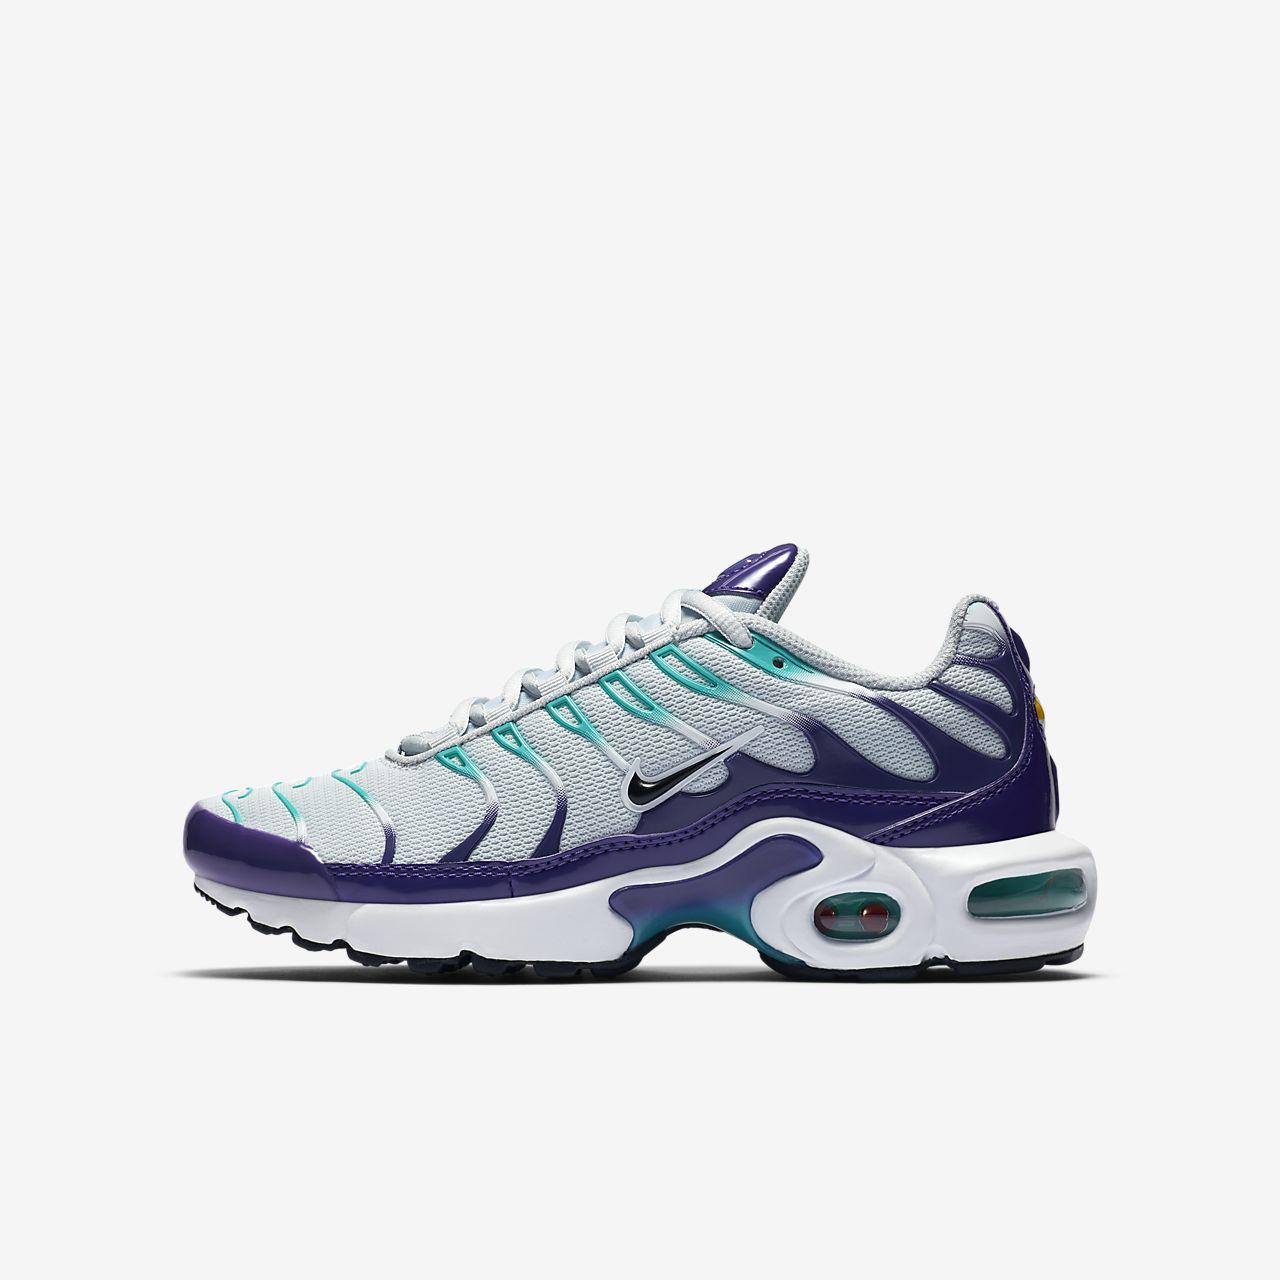 huge selection of fe3ee 2e5ec ... Nike Air Max Plus Schuh für ältere Kinder